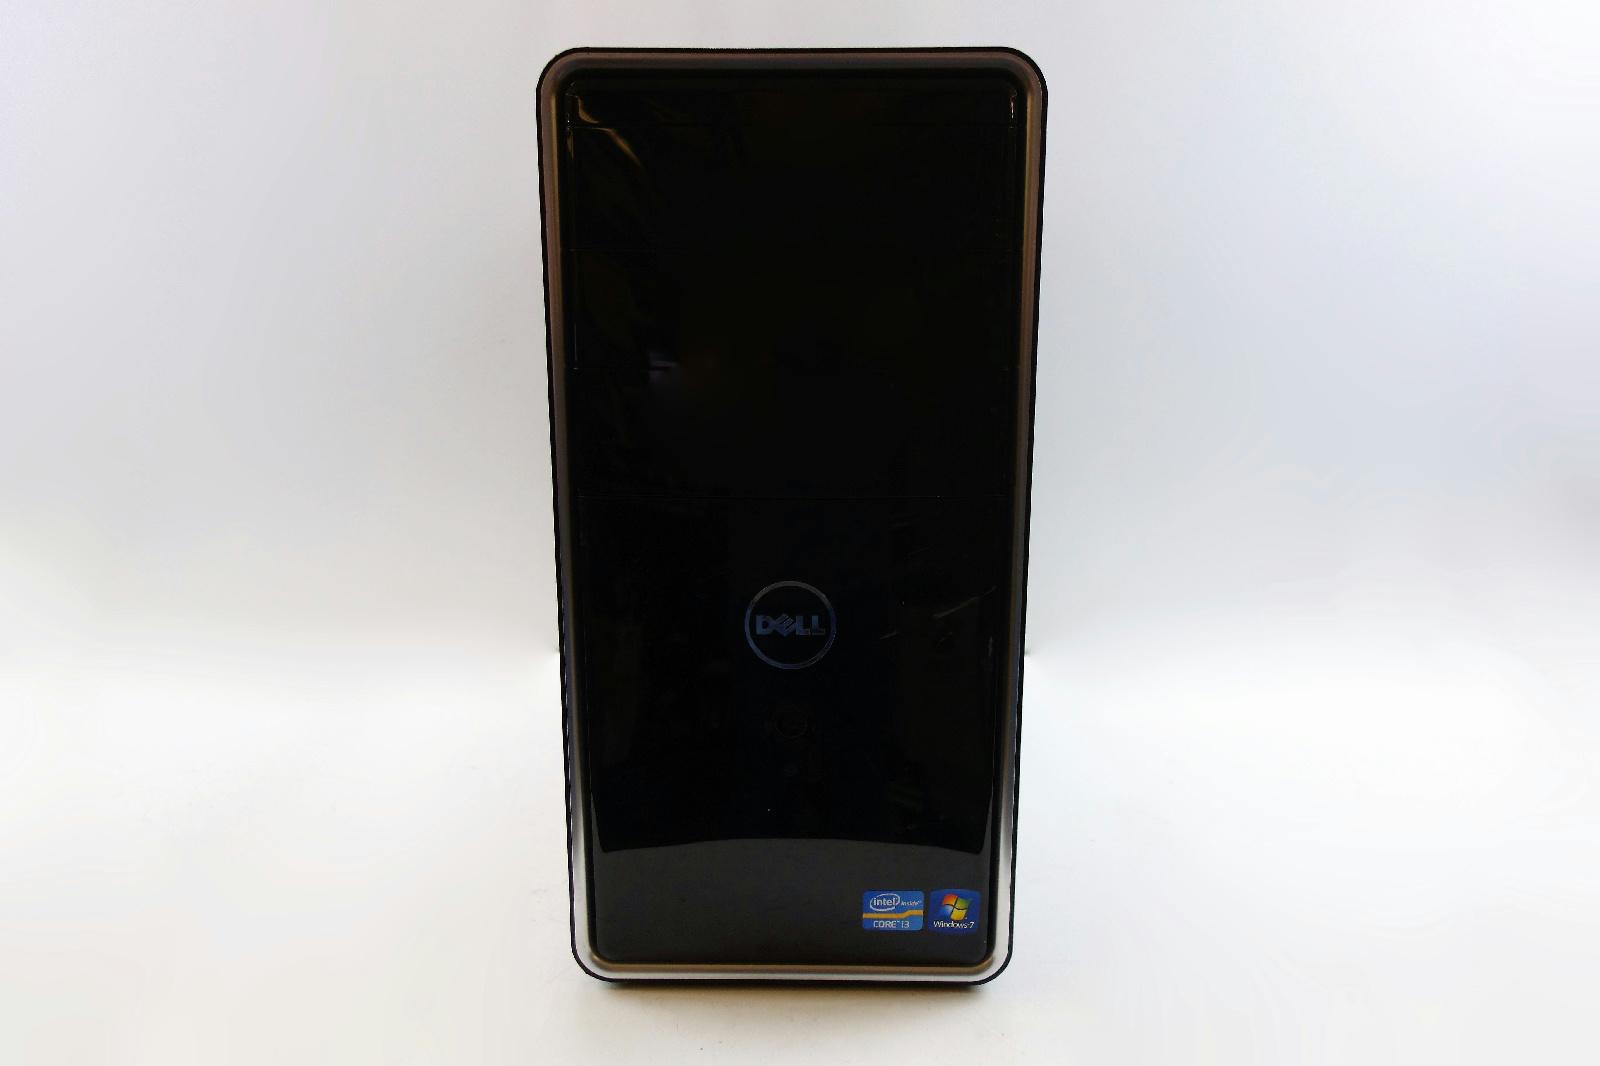 dell inspiron 620 mini tower desktop intel core i3 2100 8gb ram 1tb hdd ebay. Black Bedroom Furniture Sets. Home Design Ideas